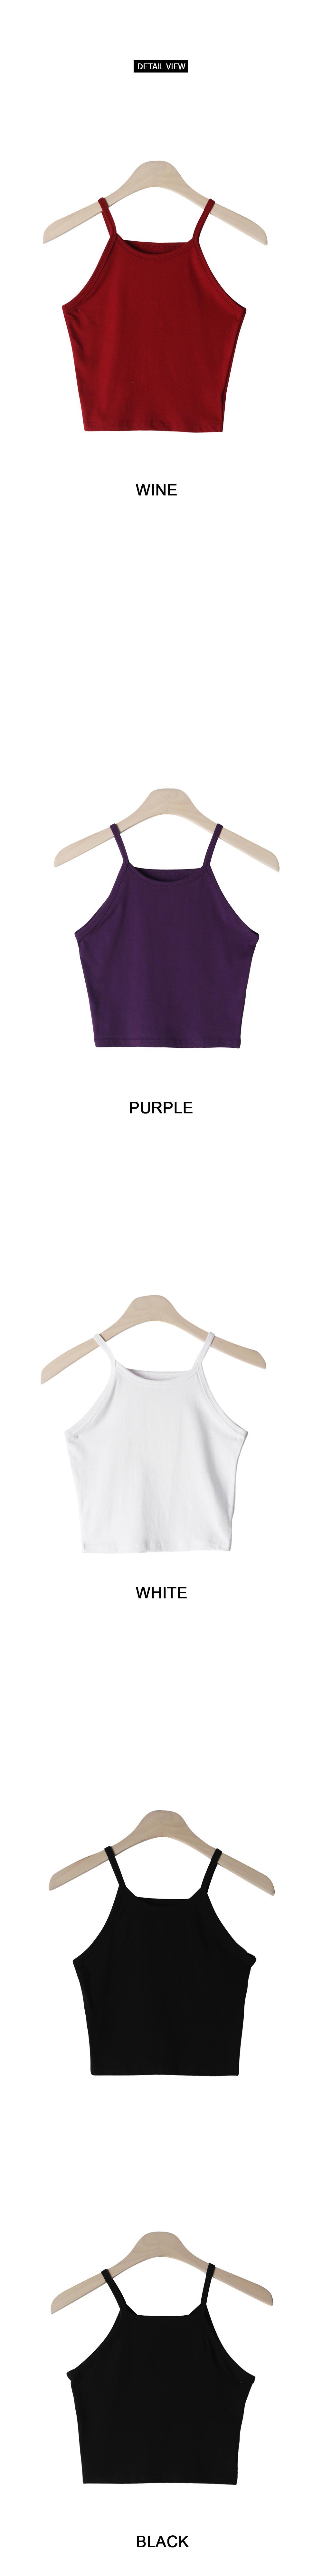 Layered color sleeveless shirt